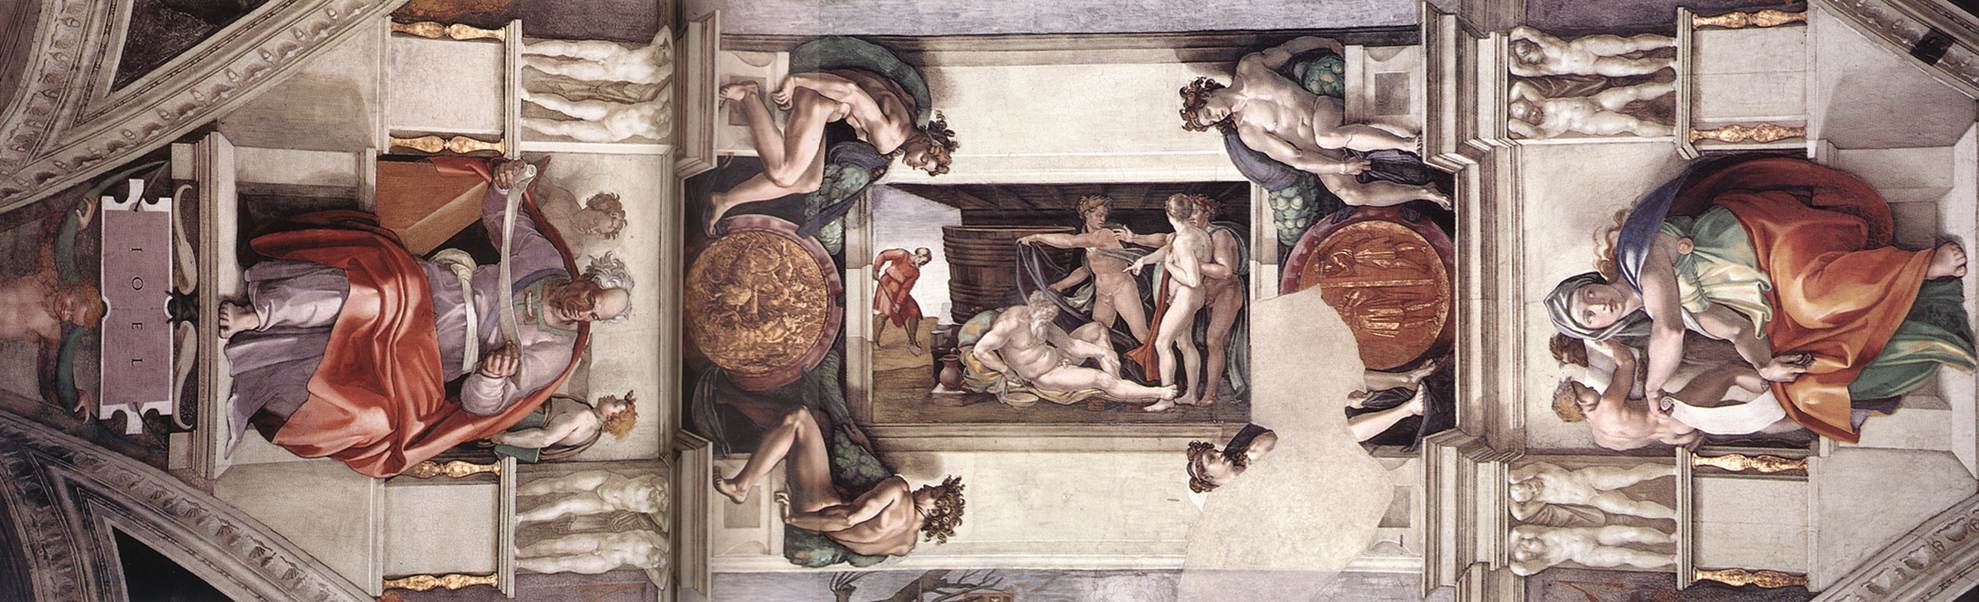 the renaissance and michelangelos sistine chapter